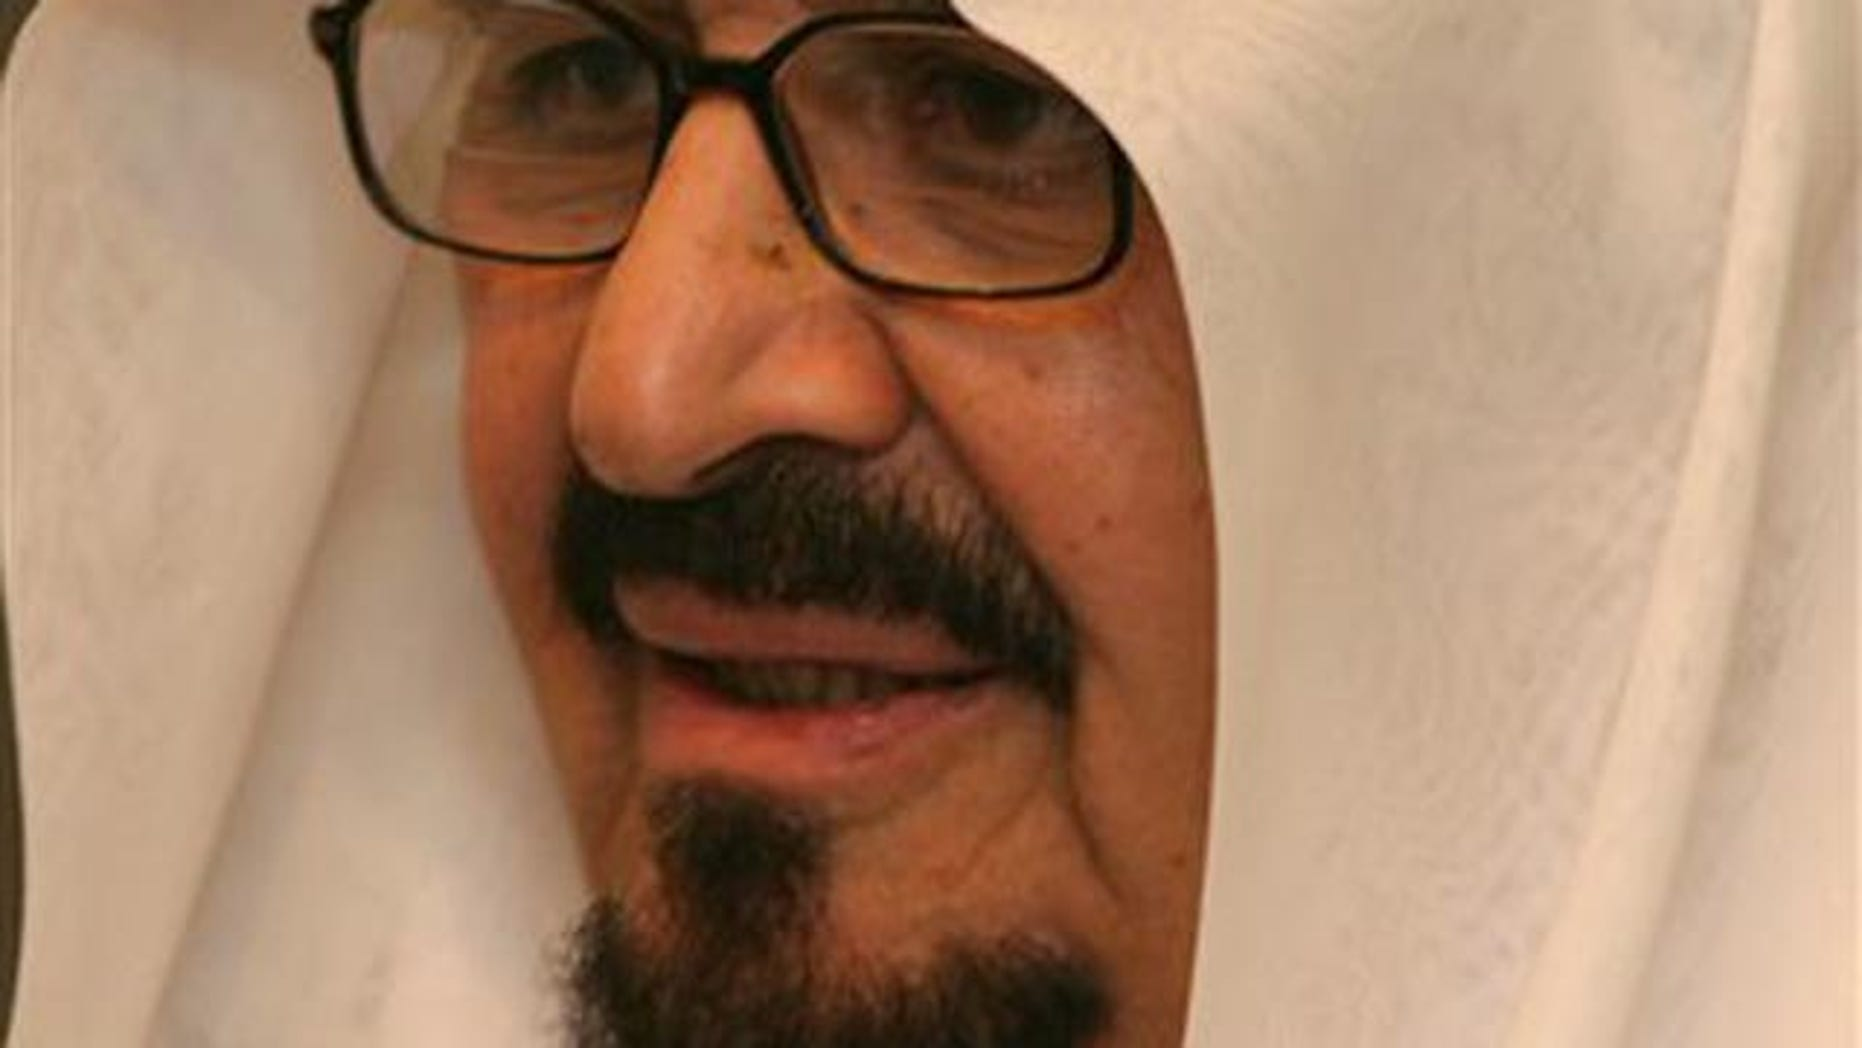 Saudi Arabia's Crown Prince Sultan bin Abdul Aziz Al Saud